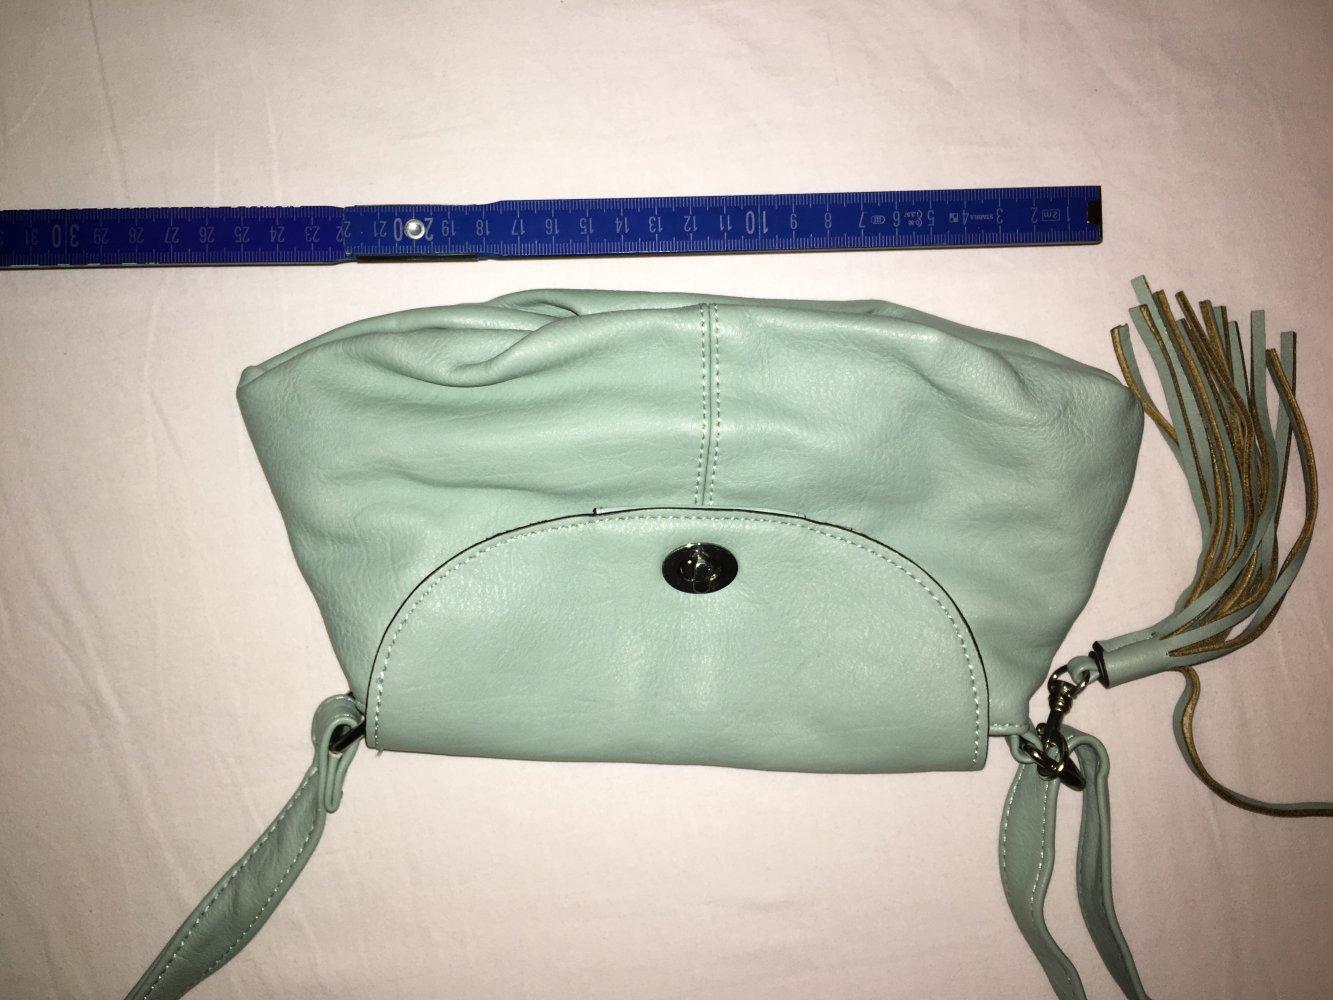 c1dba968664c8 Mintgrüne Mini Handtasche Mintgrüne Mini Handtasche Mintgrüne Mini  Handtasche ...